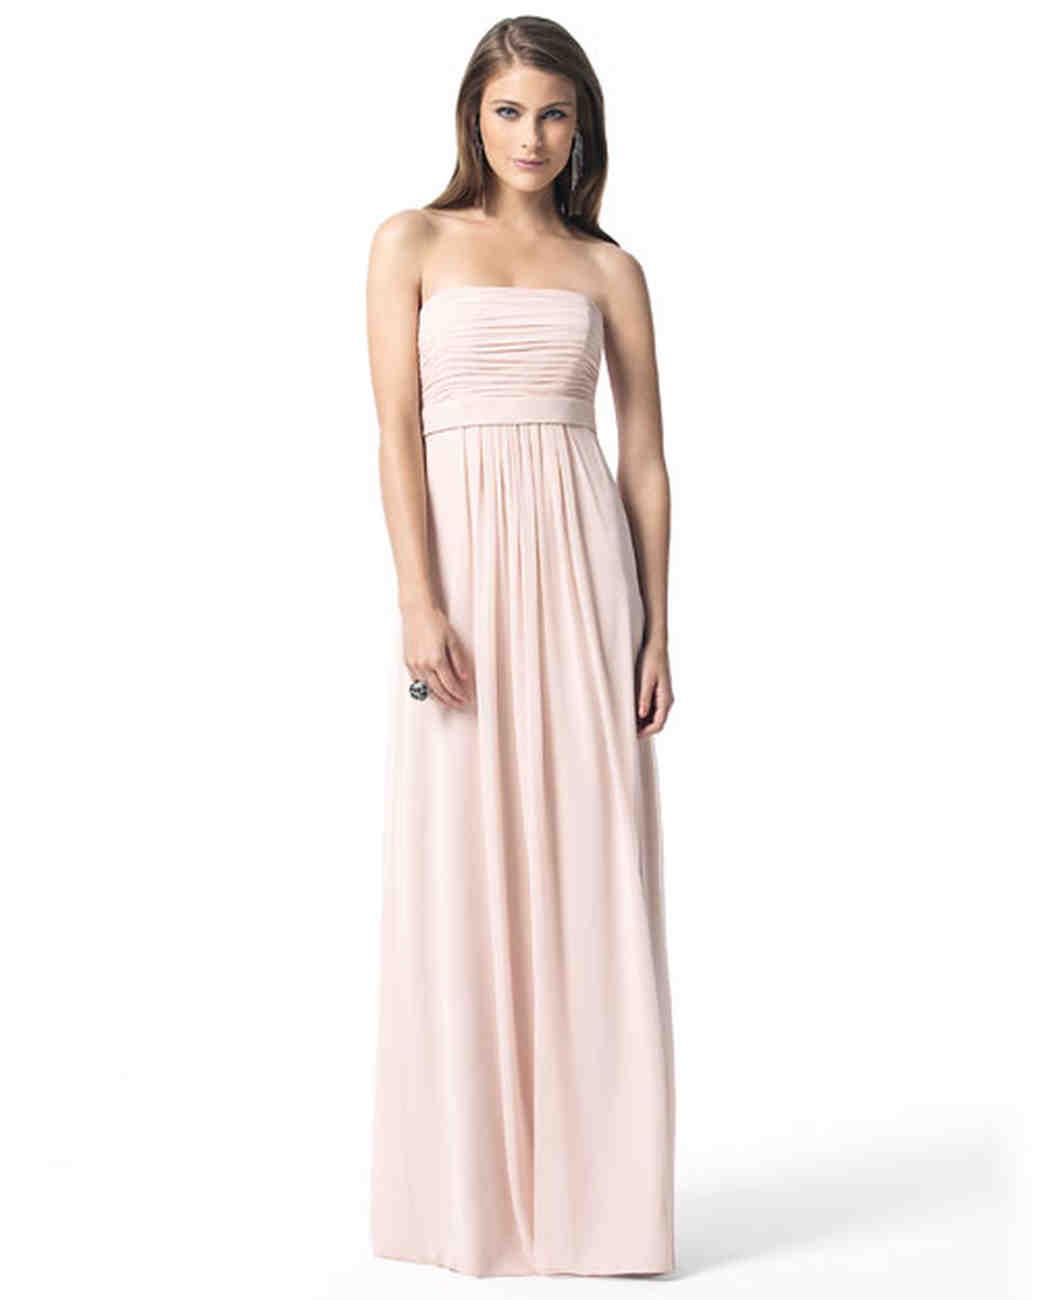 Bridesmaid Dresses For Beach Weddings Martha Stewart Weddings